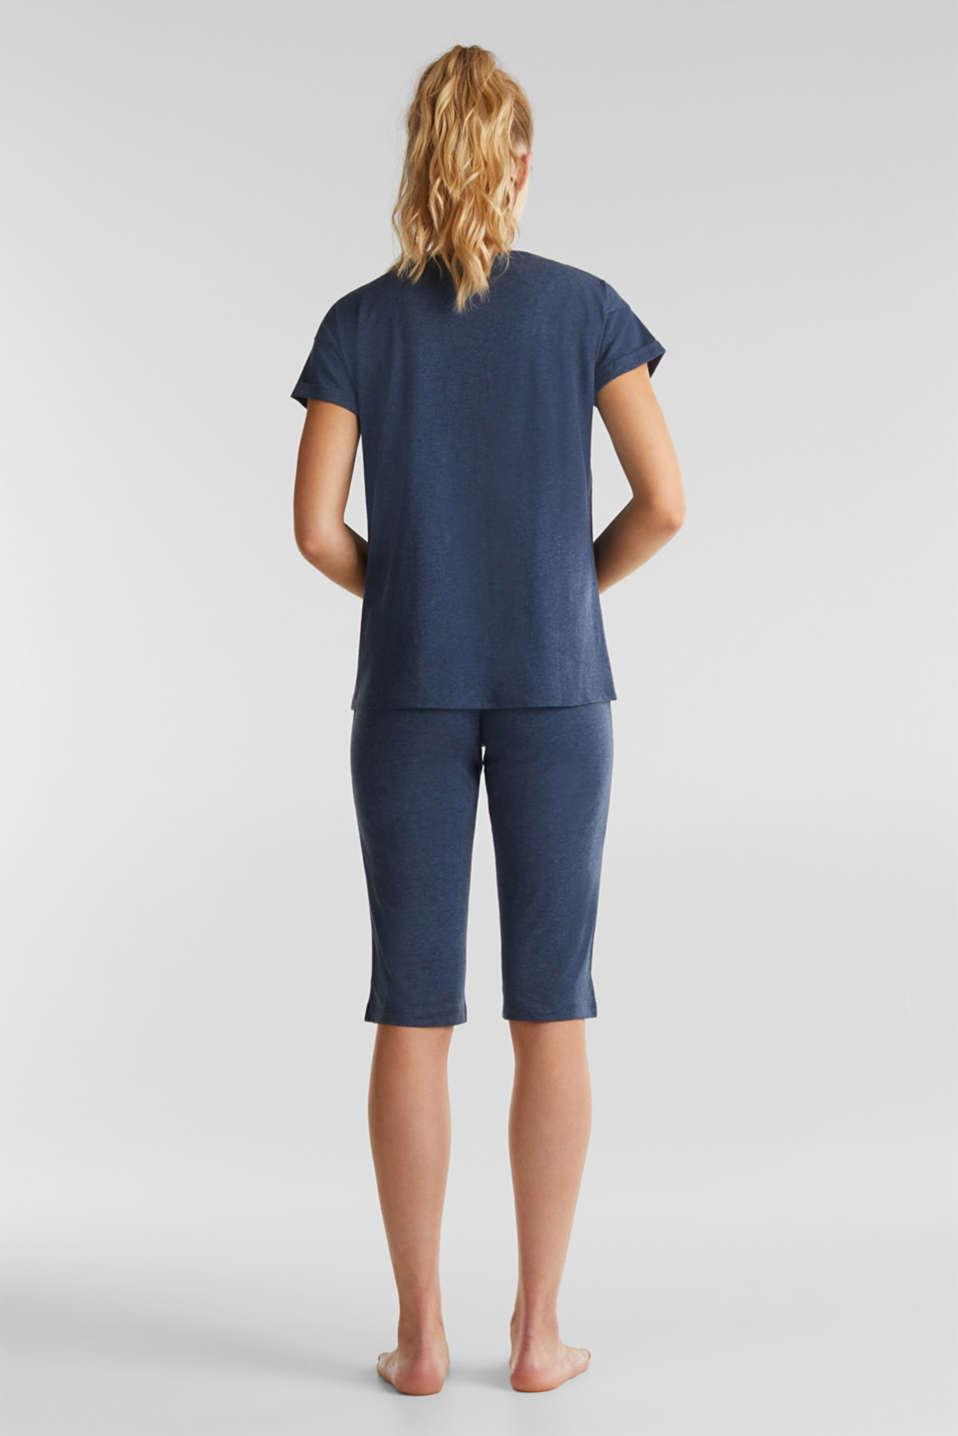 Jersey pyjamas with Bermuda bottoms, NAVY 2, detail image number 1